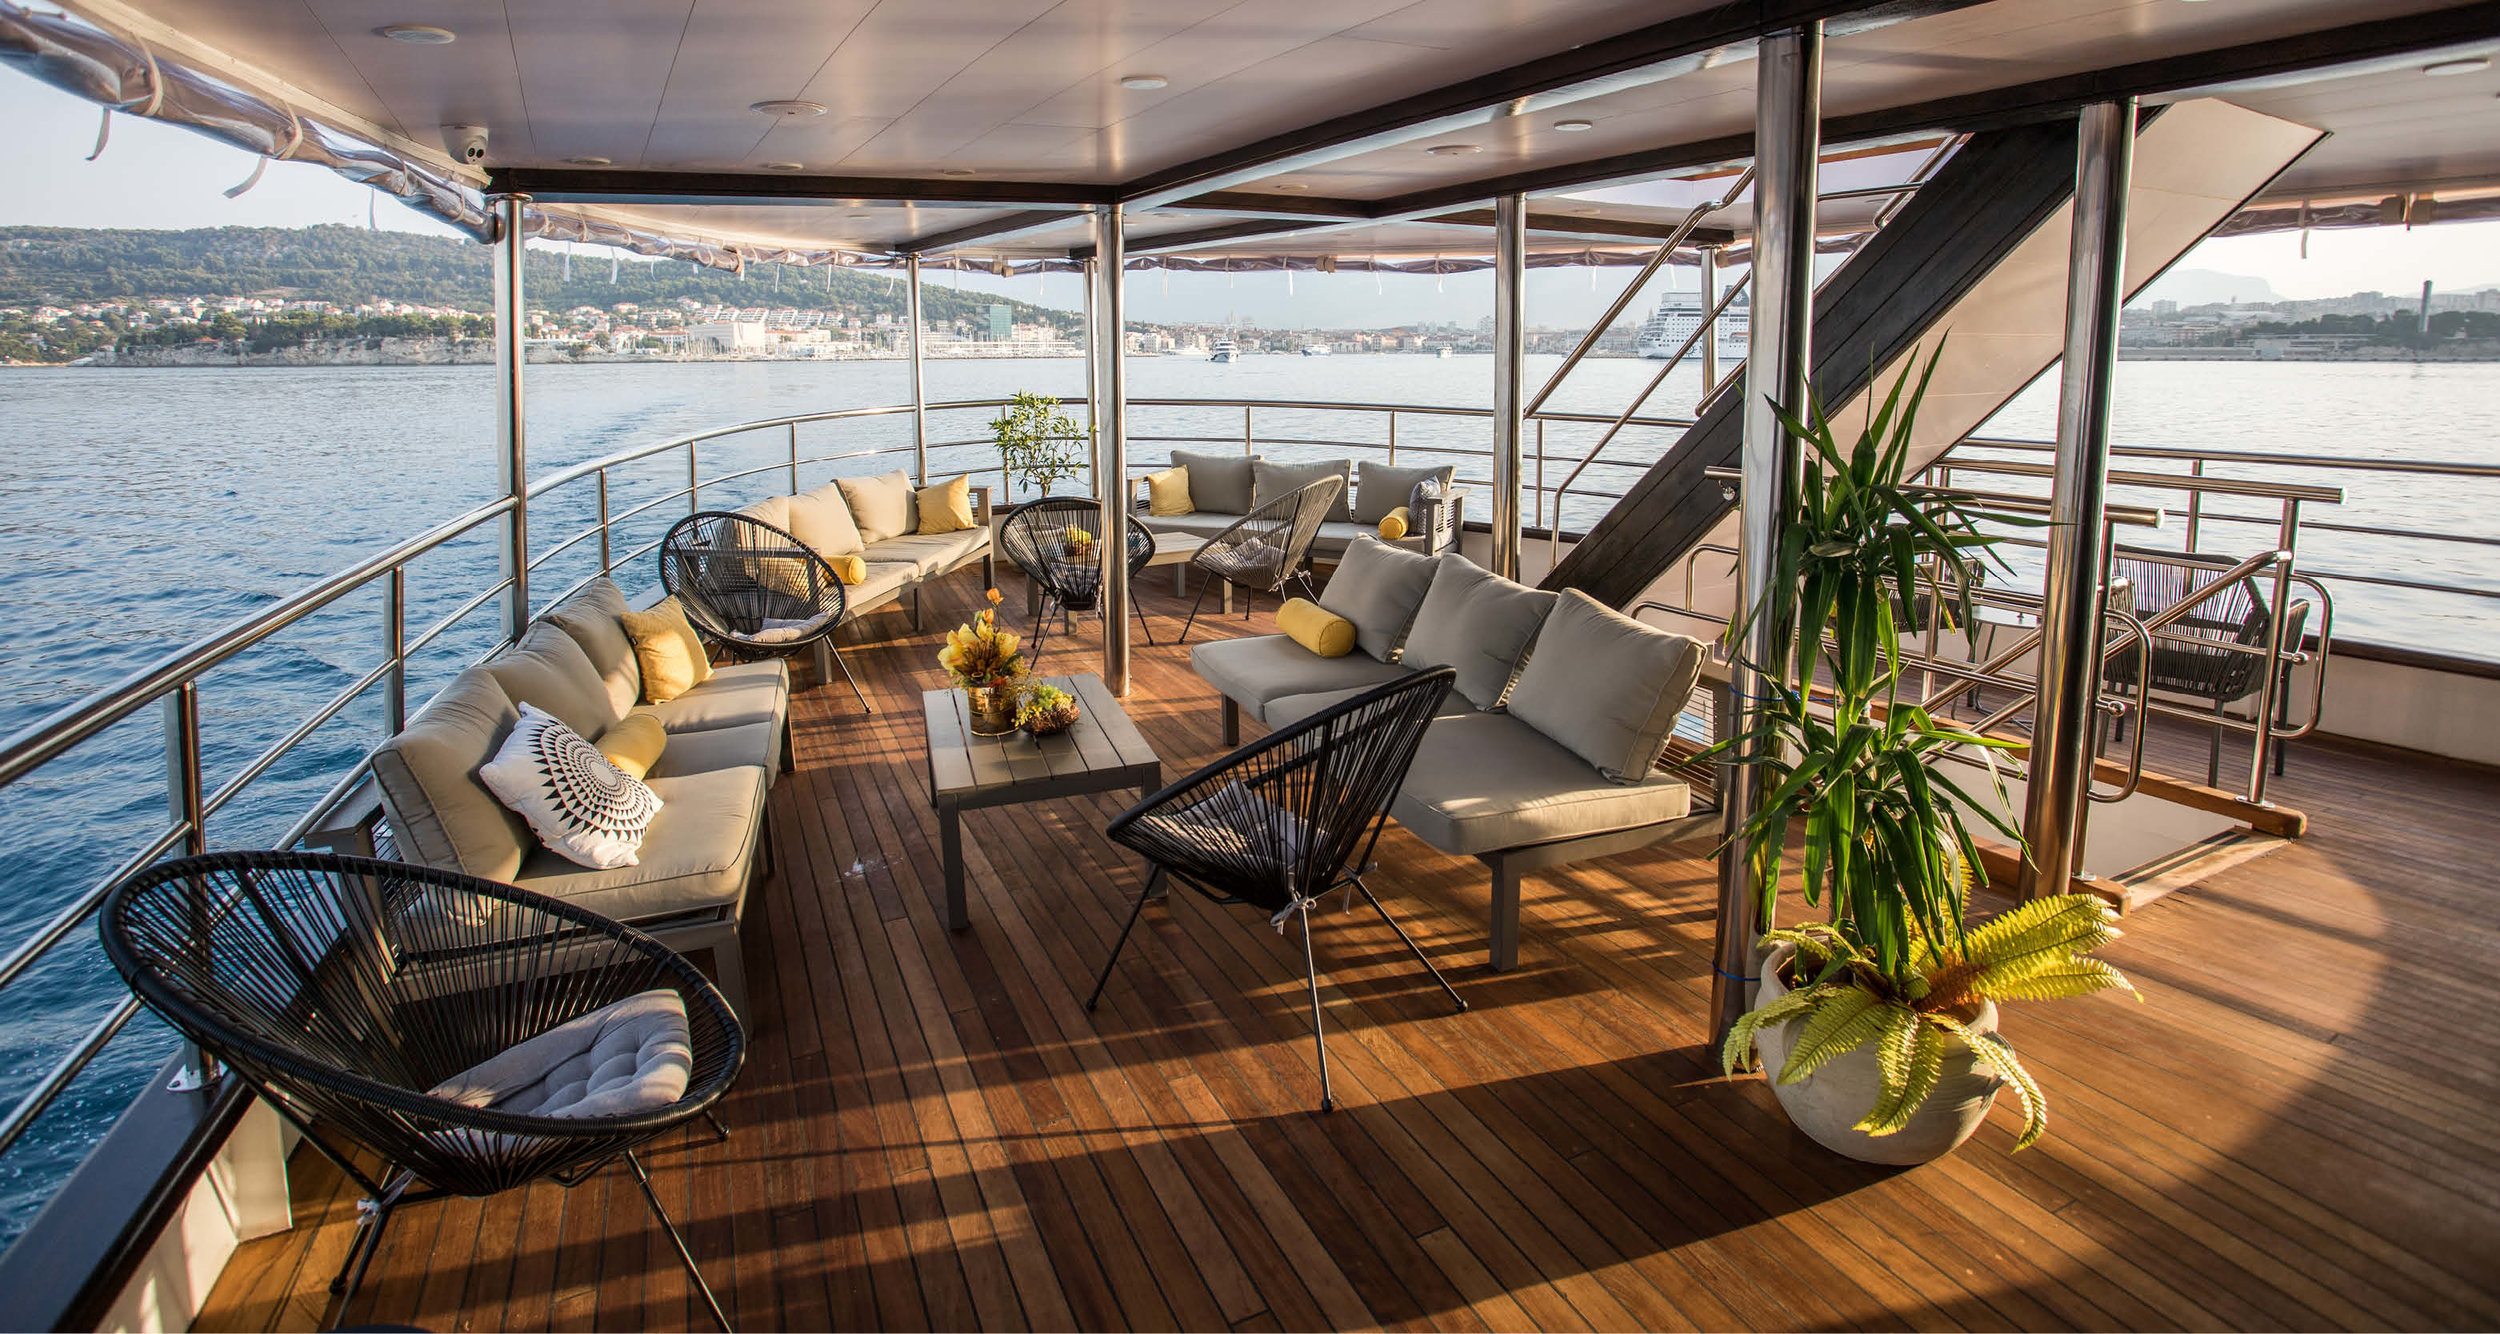 Dream-Maker-Travel-Ship-MS-Arca-Deck.jpg